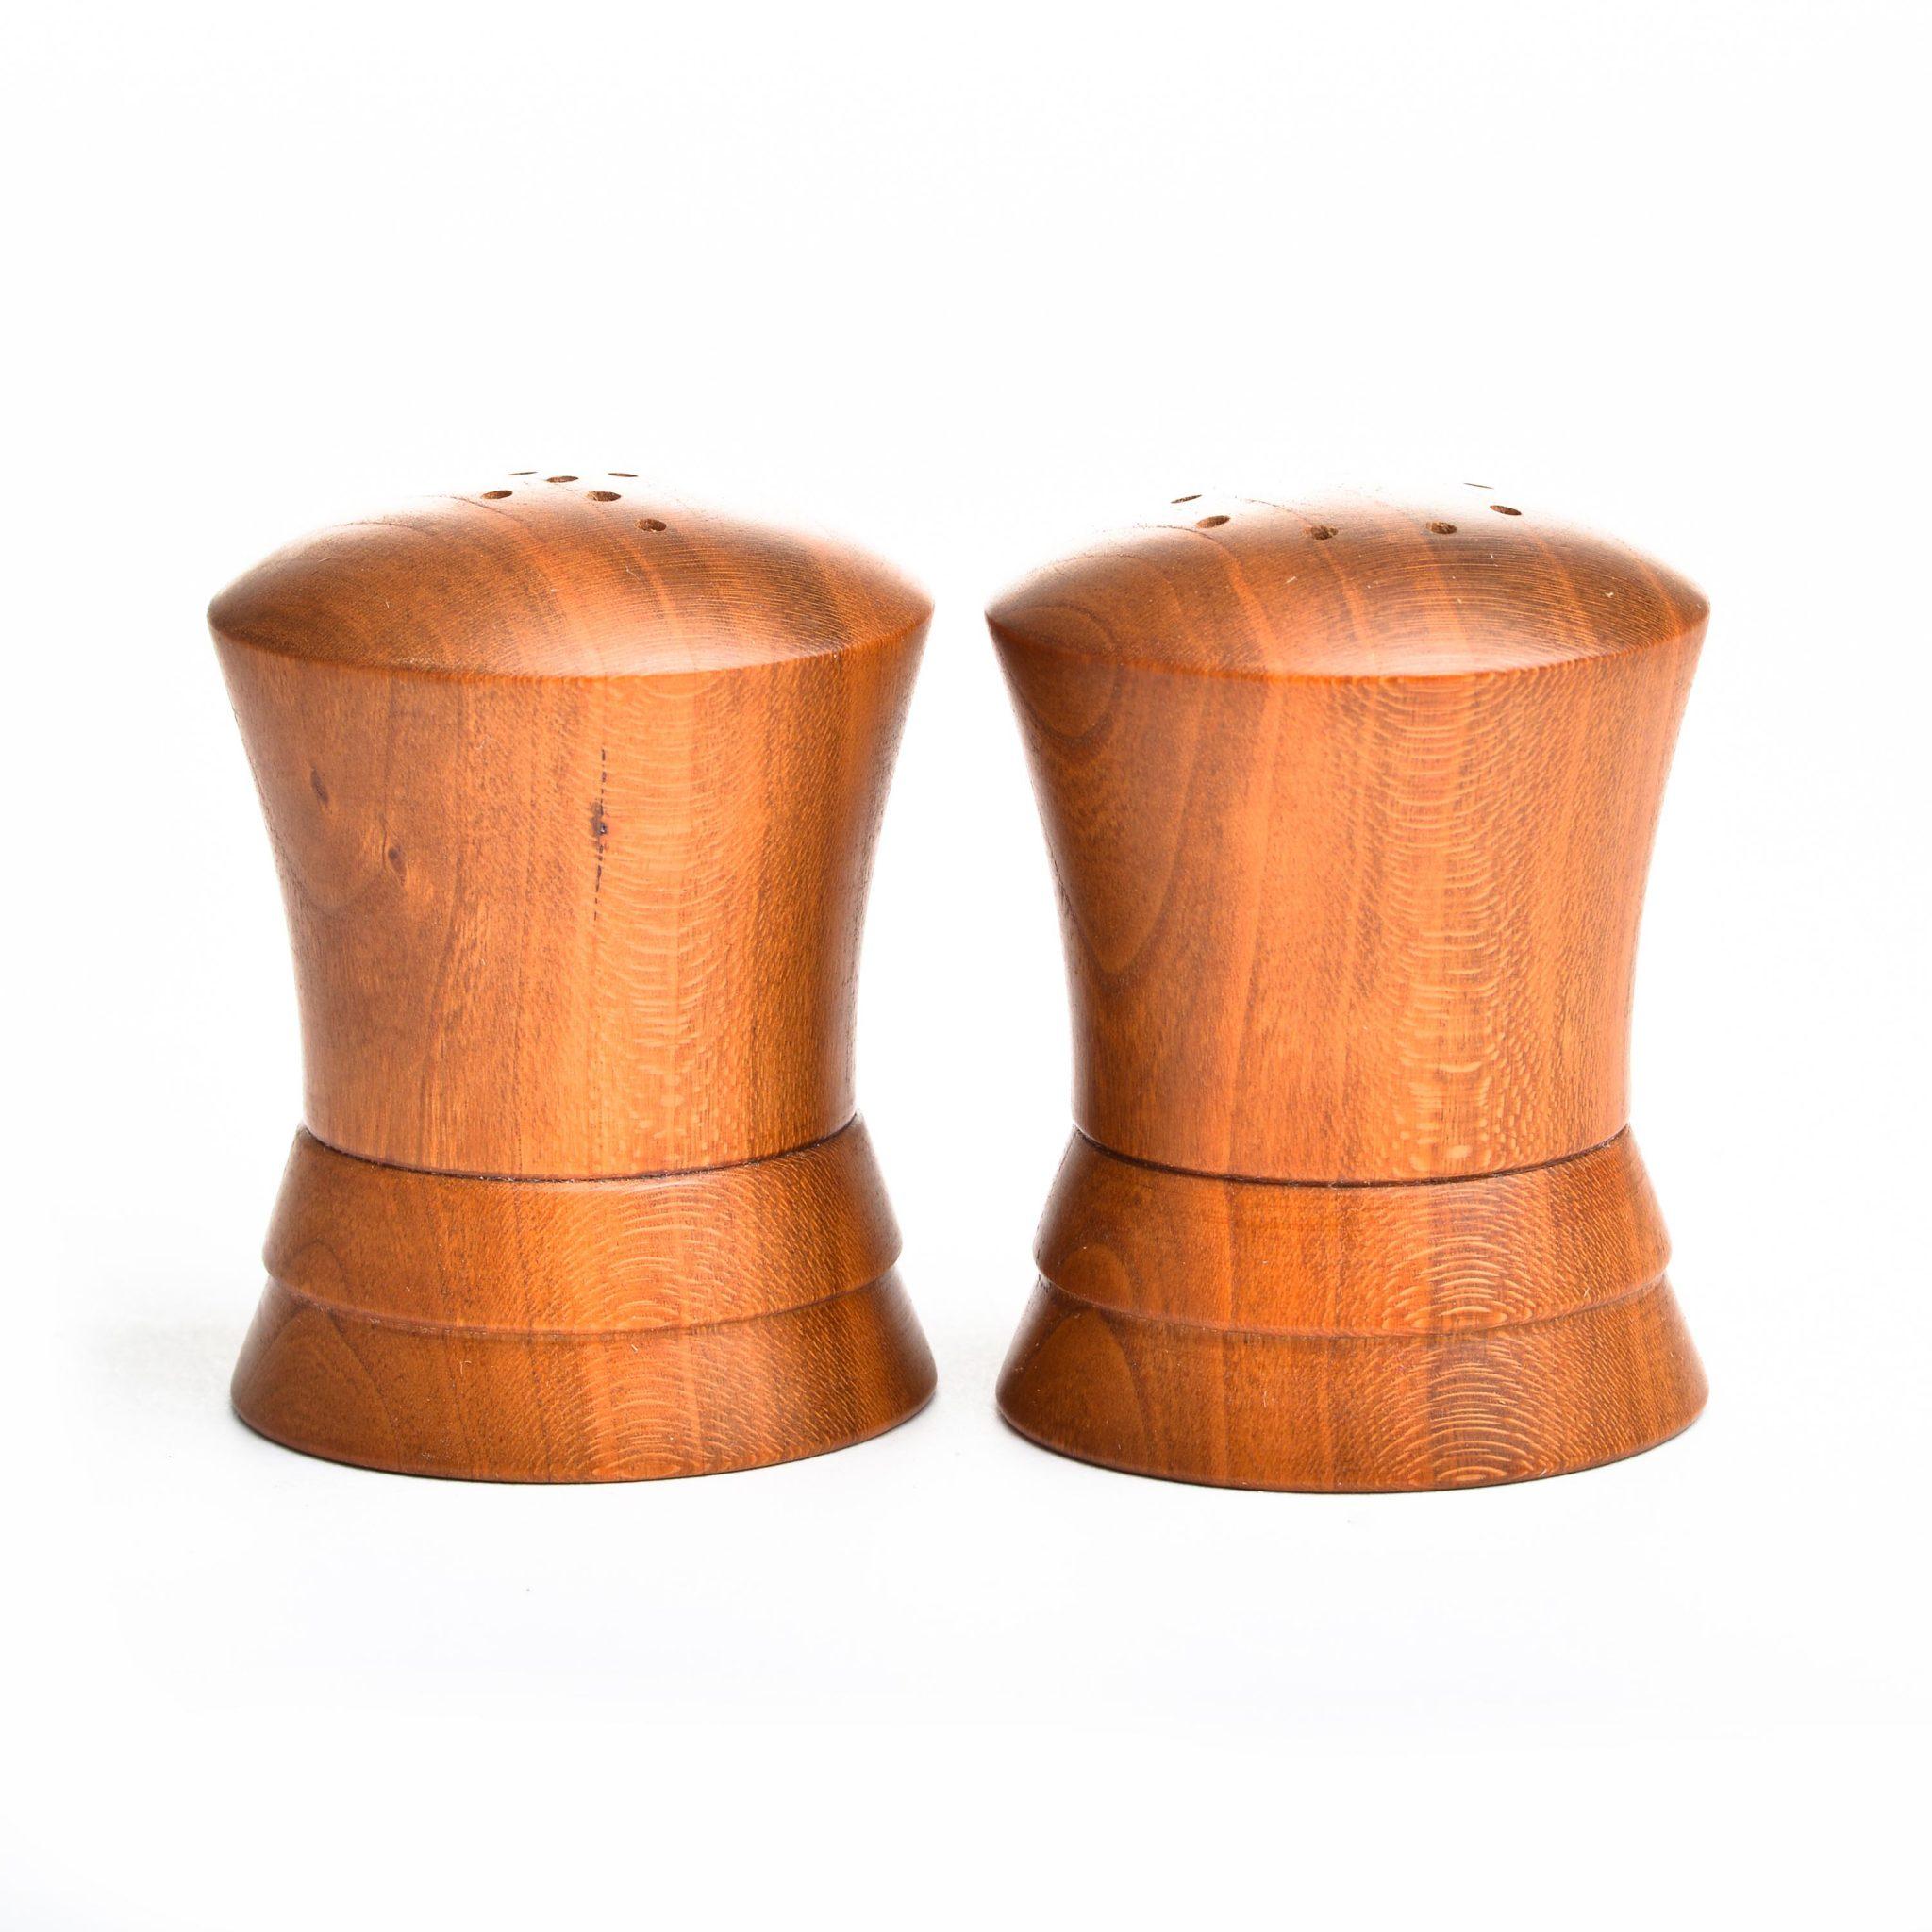 Turned Salt Pepper Shakers Southern Highland Craft Guild